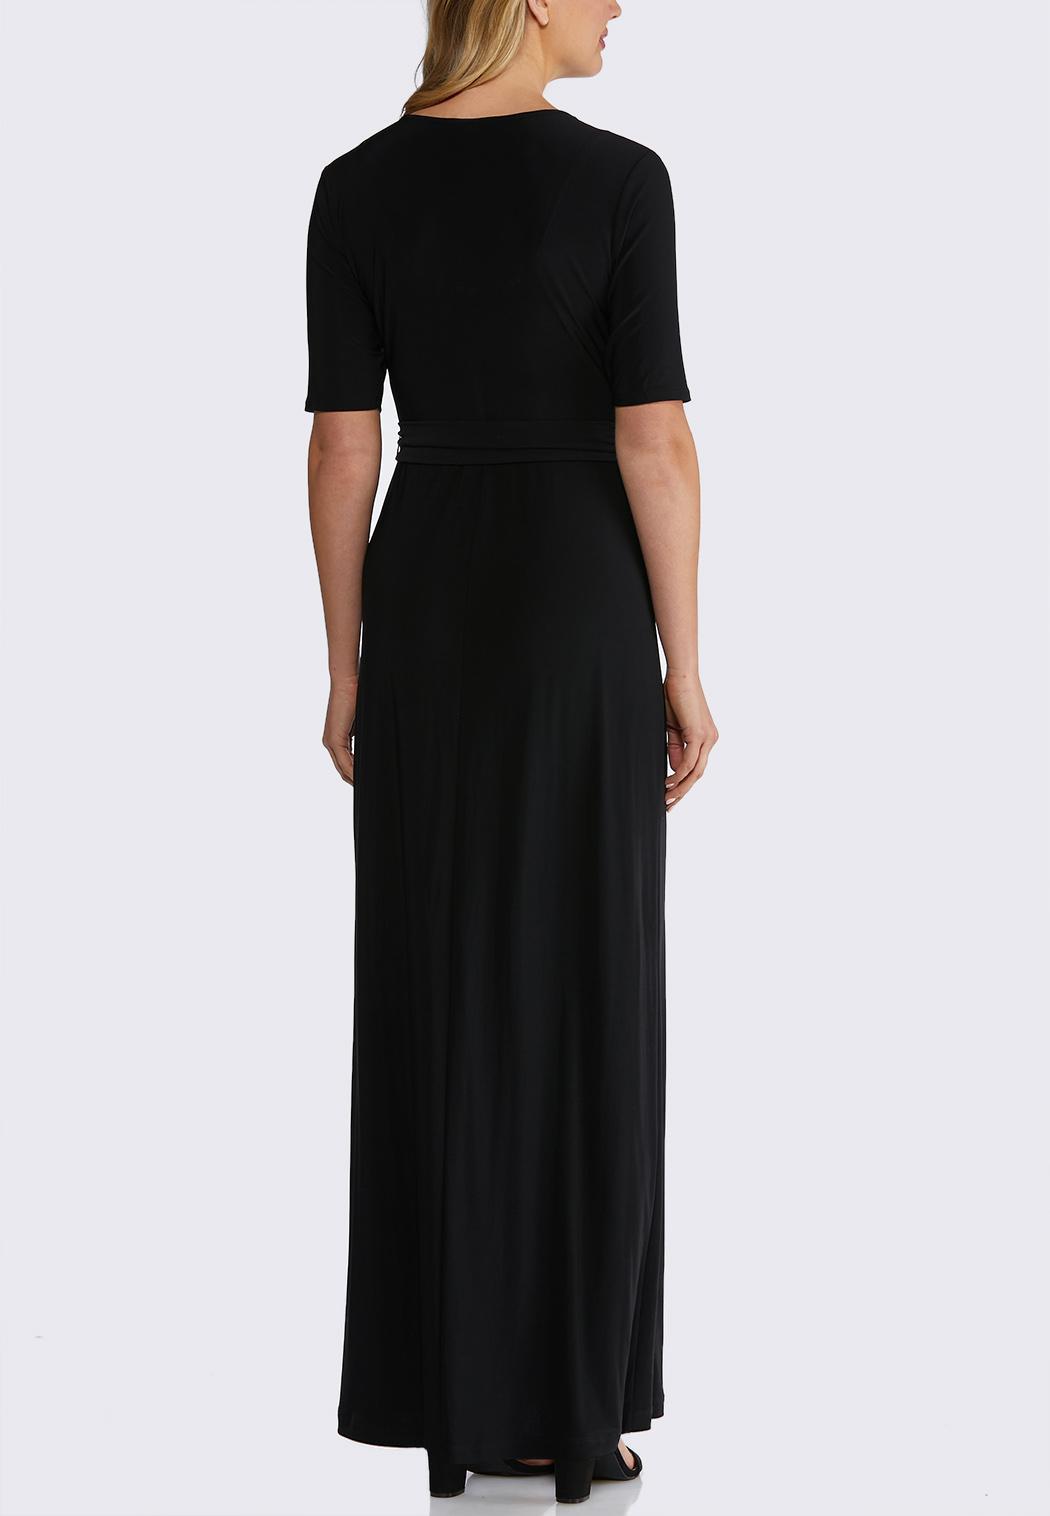 3c73cdf9966 Solid Tie Waist Maxi Dress Junior Misses Cato Fashions